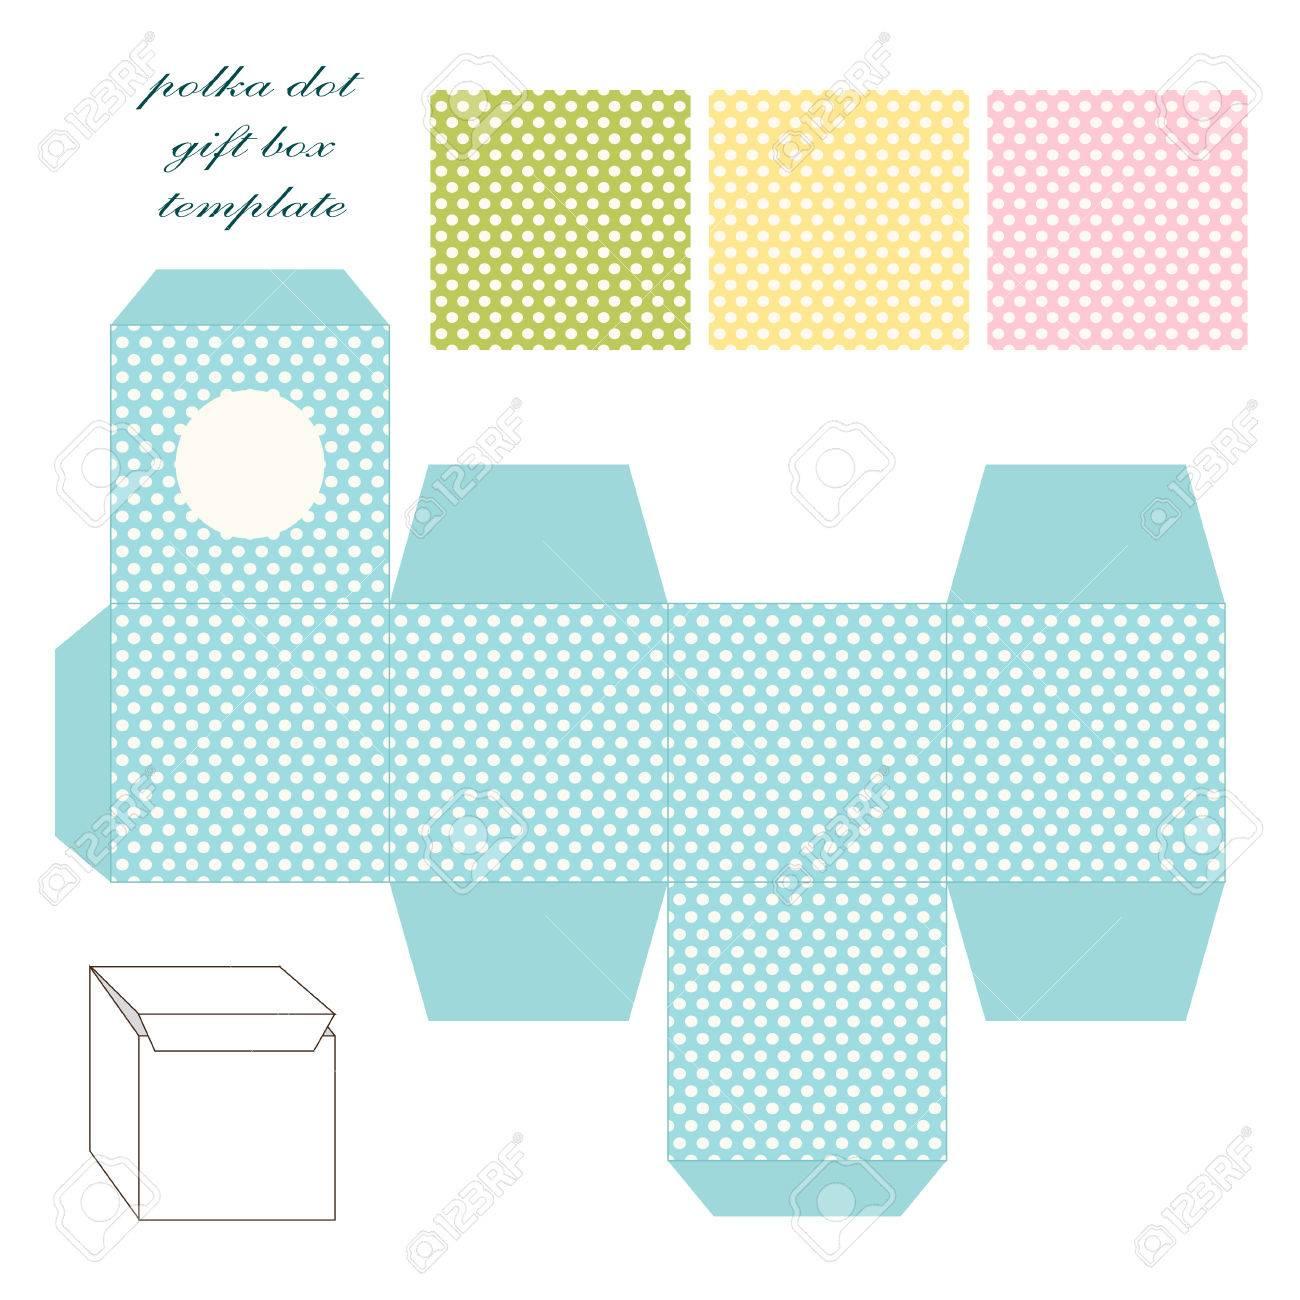 cute retro square gift box template with polka dots ornament